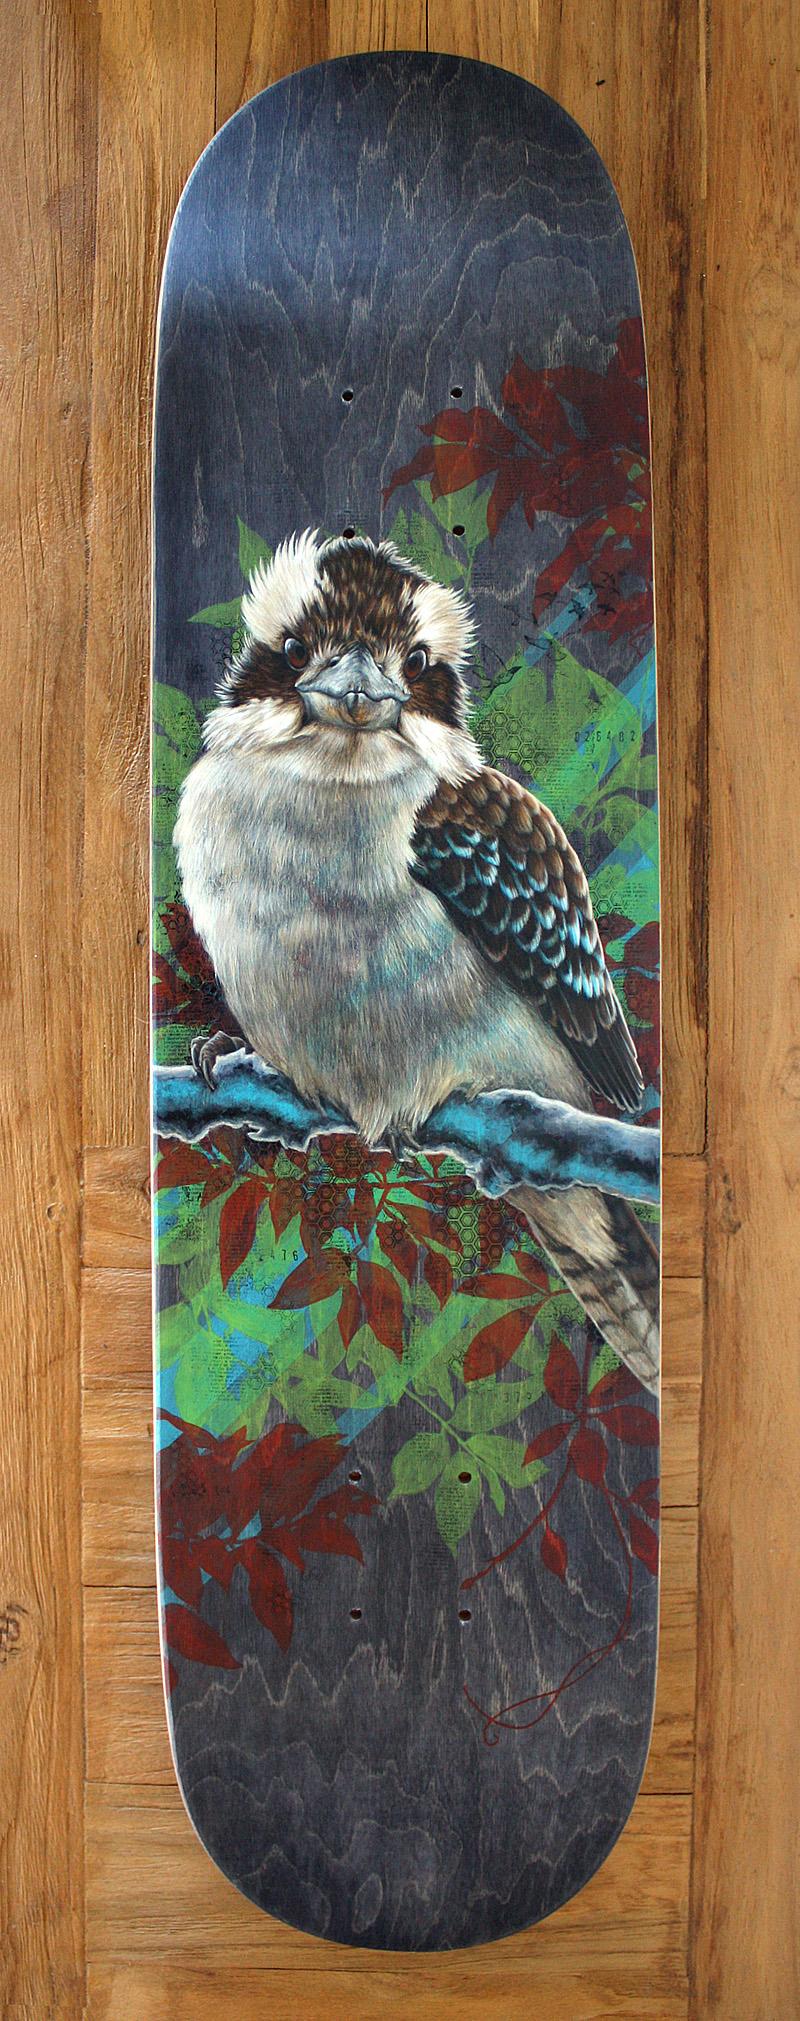 Kookaburra Deck